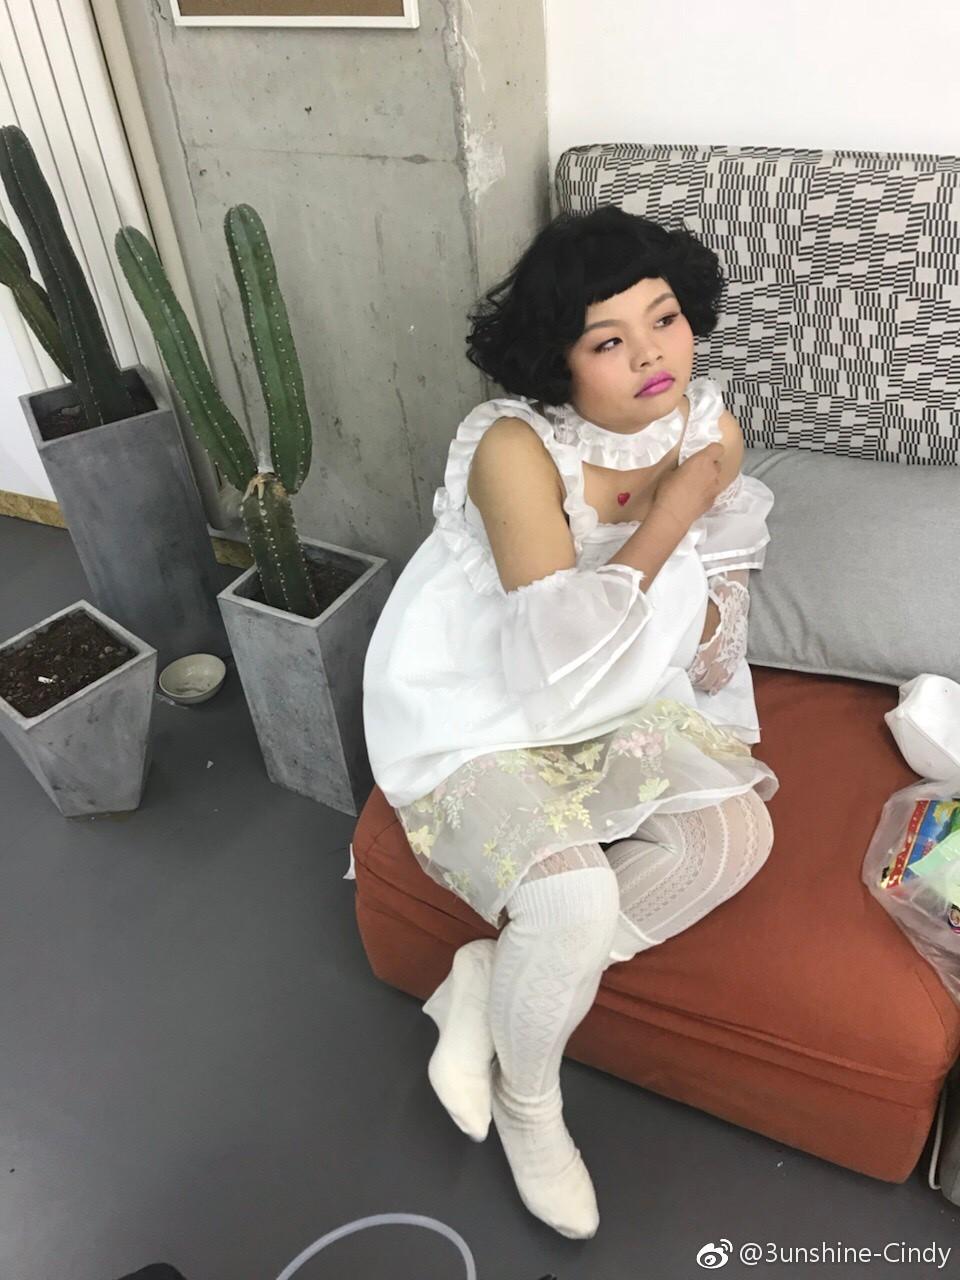 3unshine-cindy weibo